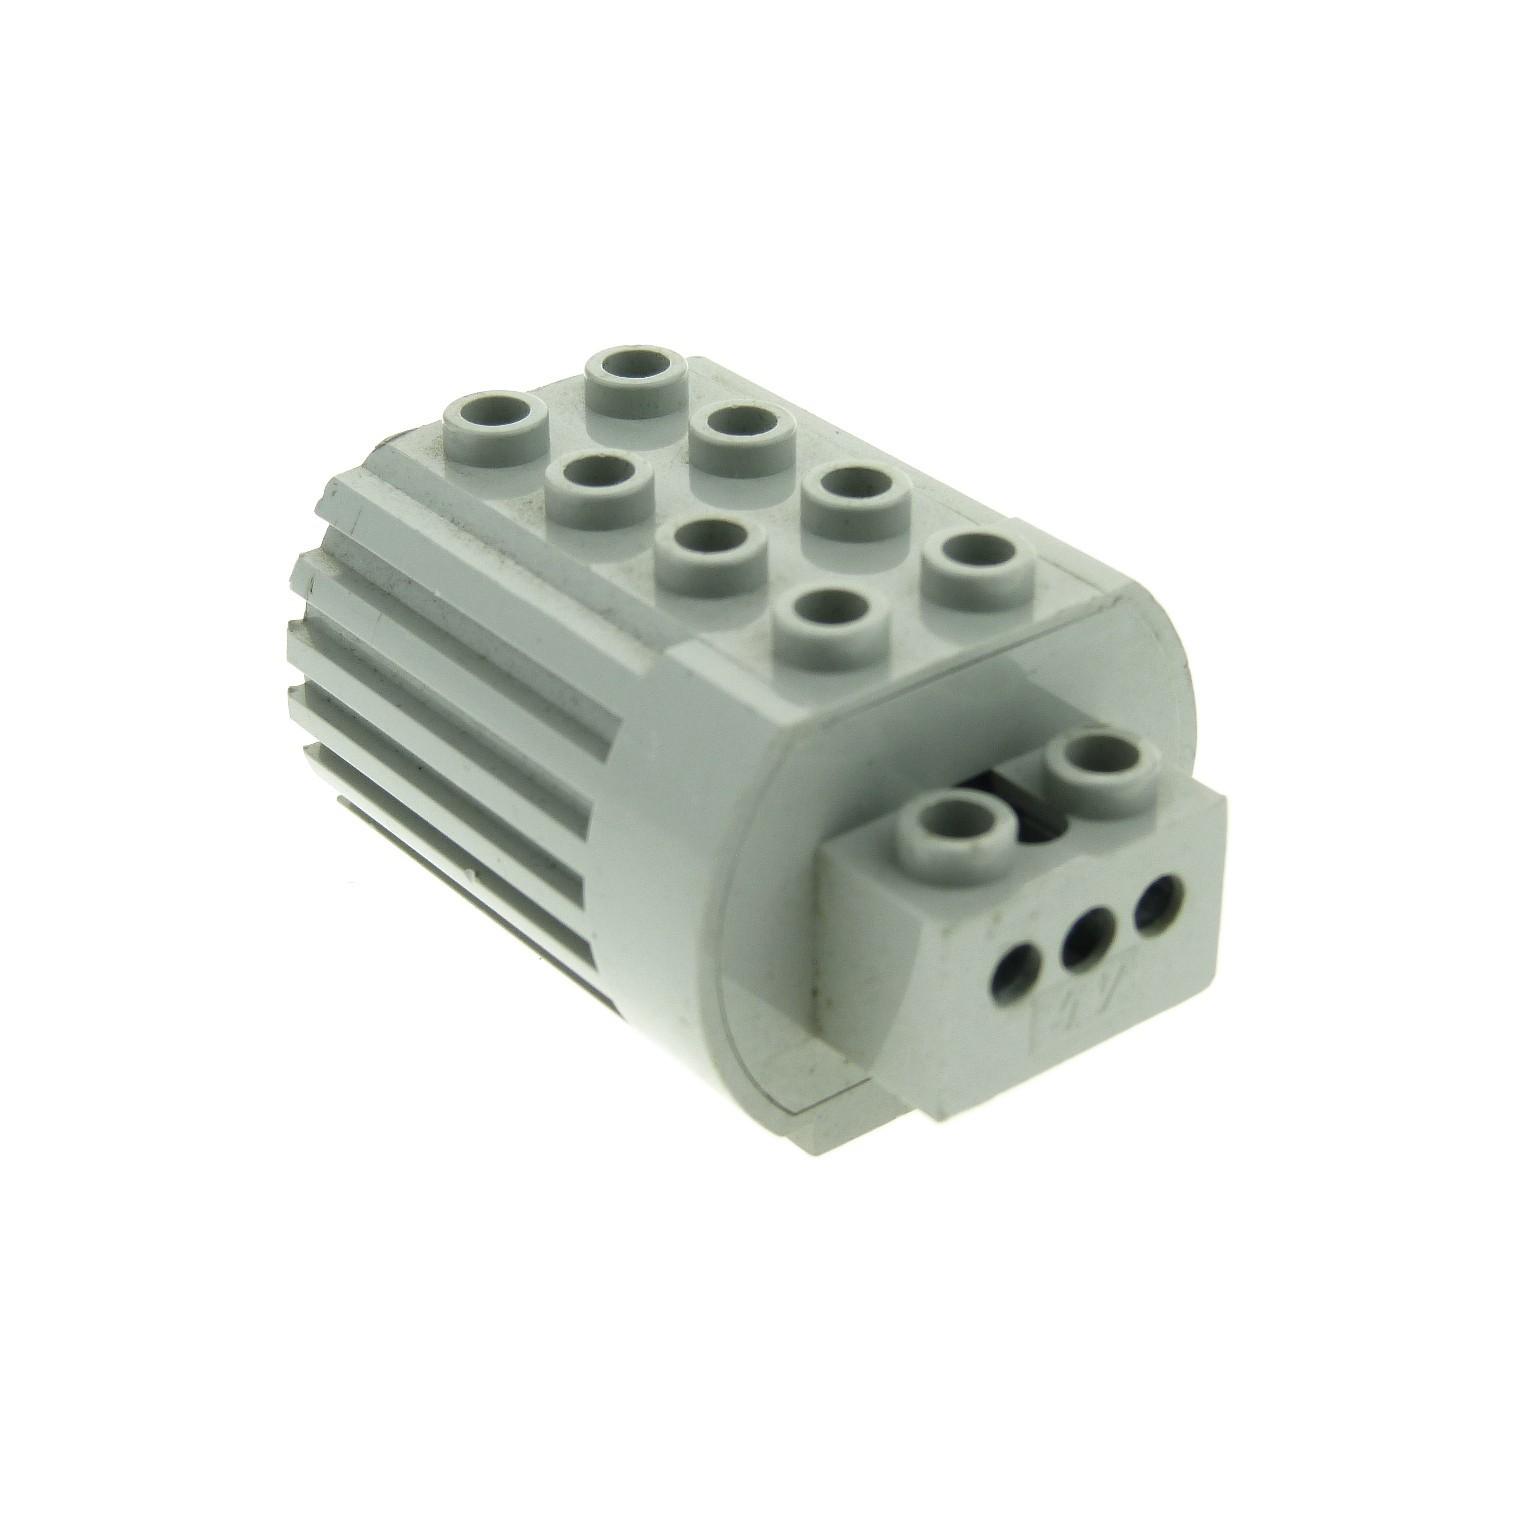 1 x lego technic electric motor b ware abgenutzt alt hell grau 4 5 v motor typ2 f r 2 polige. Black Bedroom Furniture Sets. Home Design Ideas